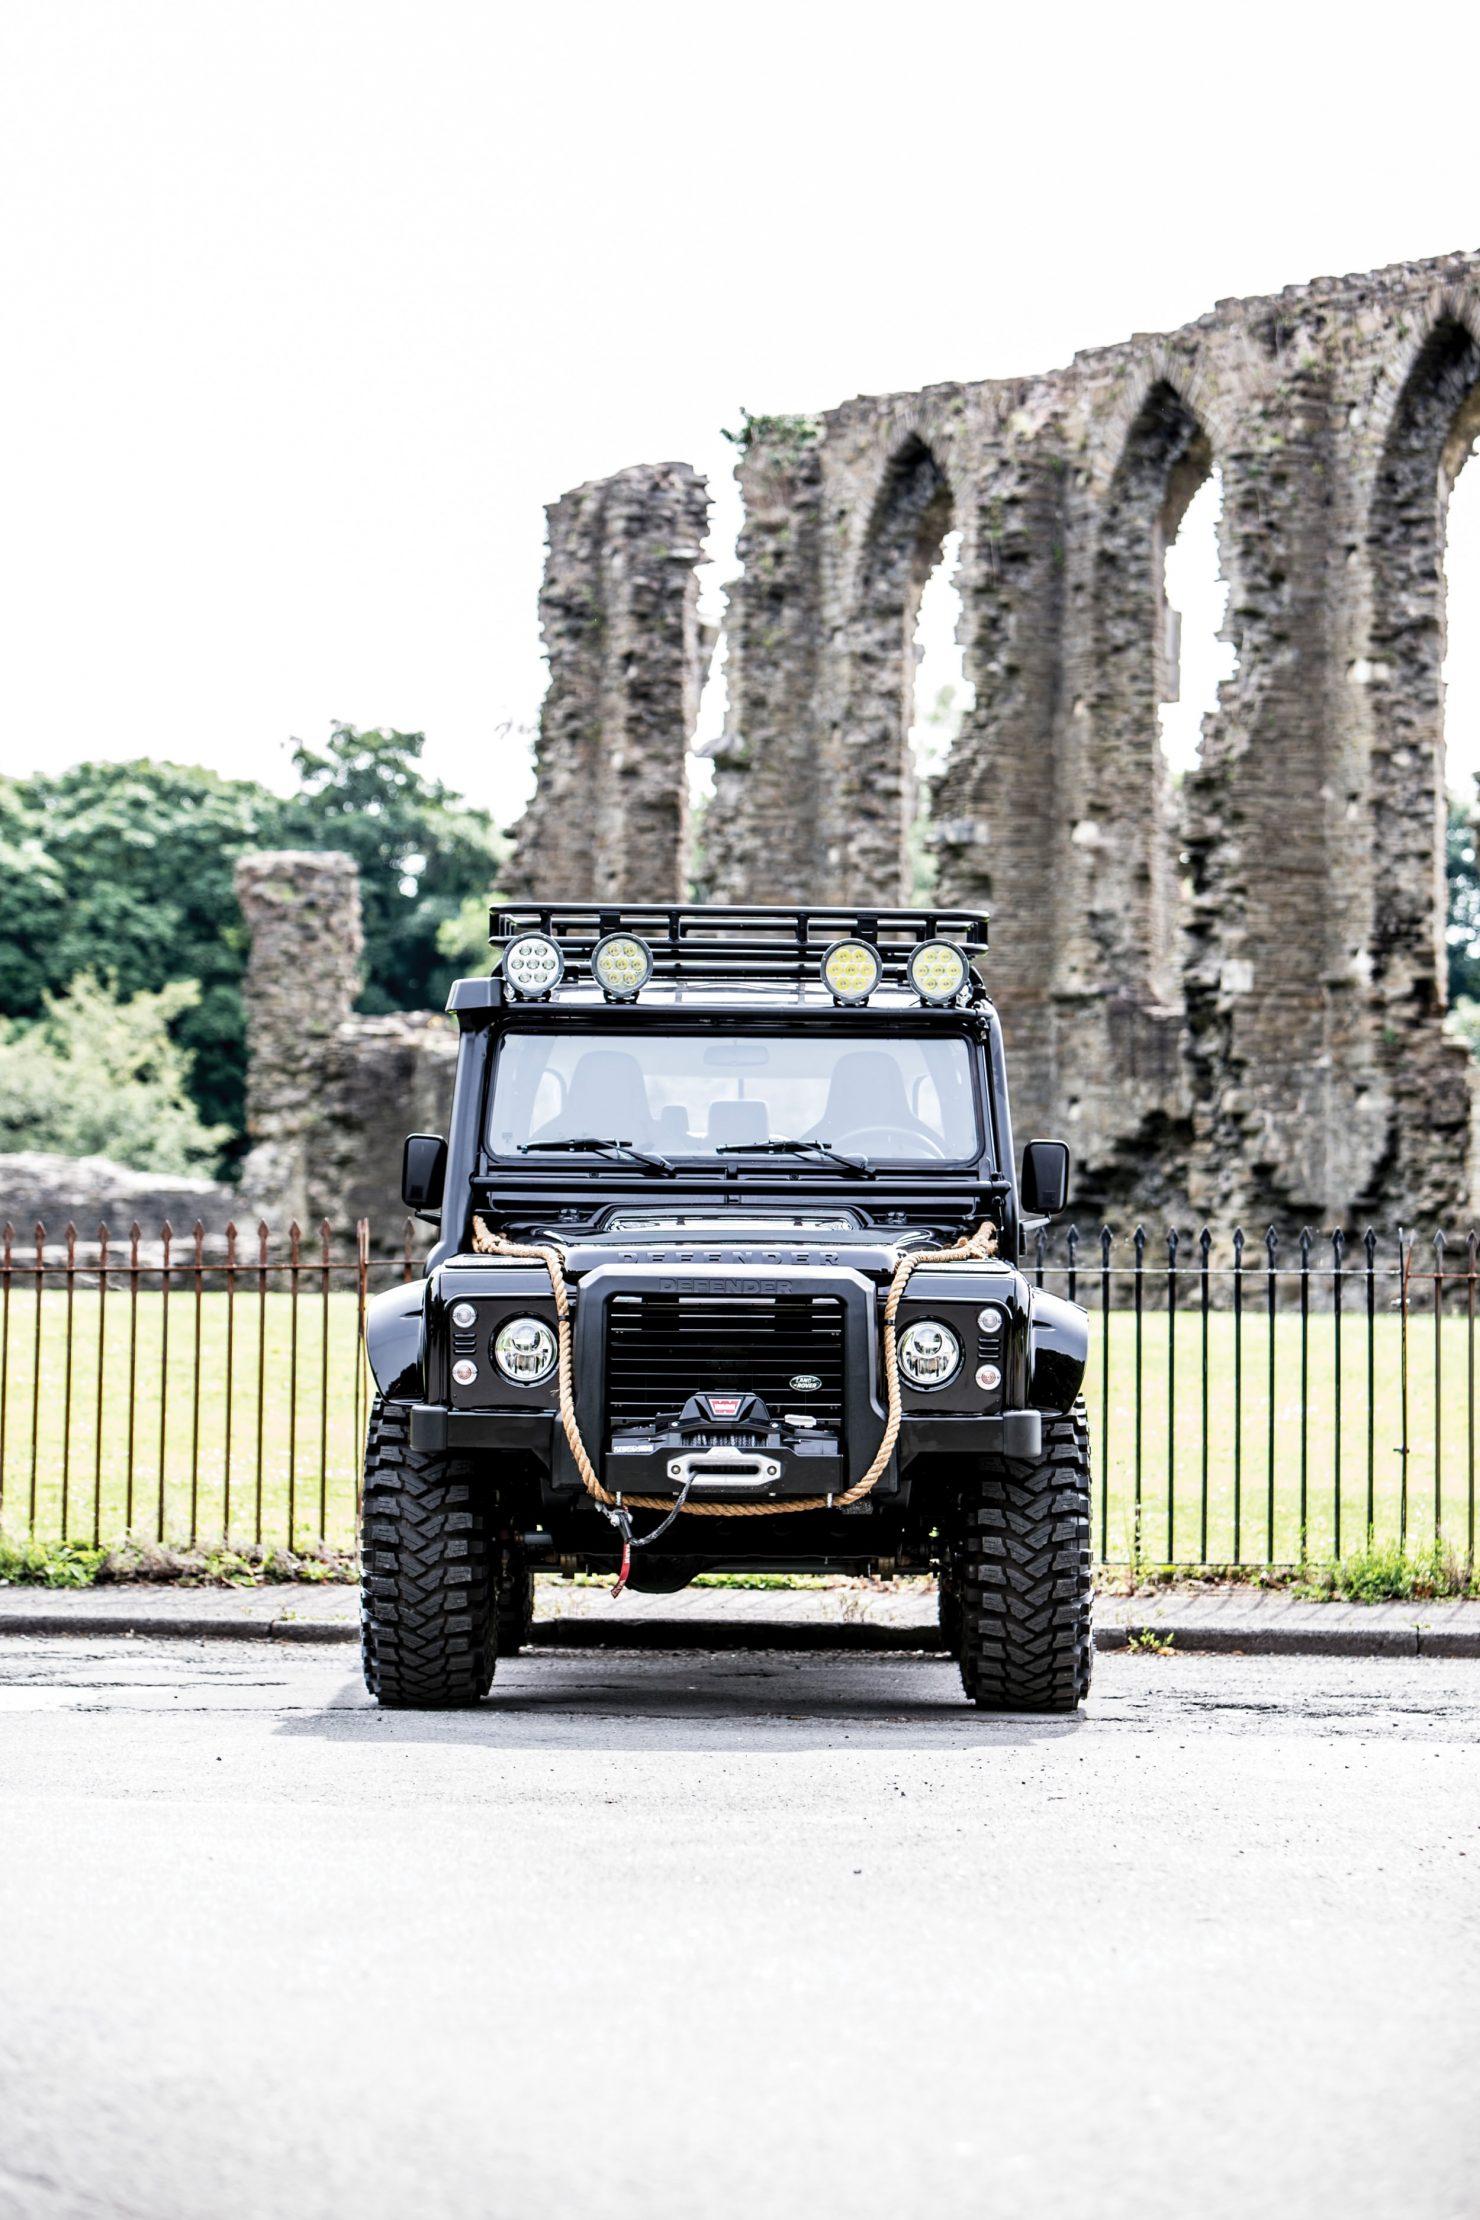 james bond spectre land rover defender svx 7 1480x2220 - Ex-James Bond Spectre - Land Rover Defender SVX